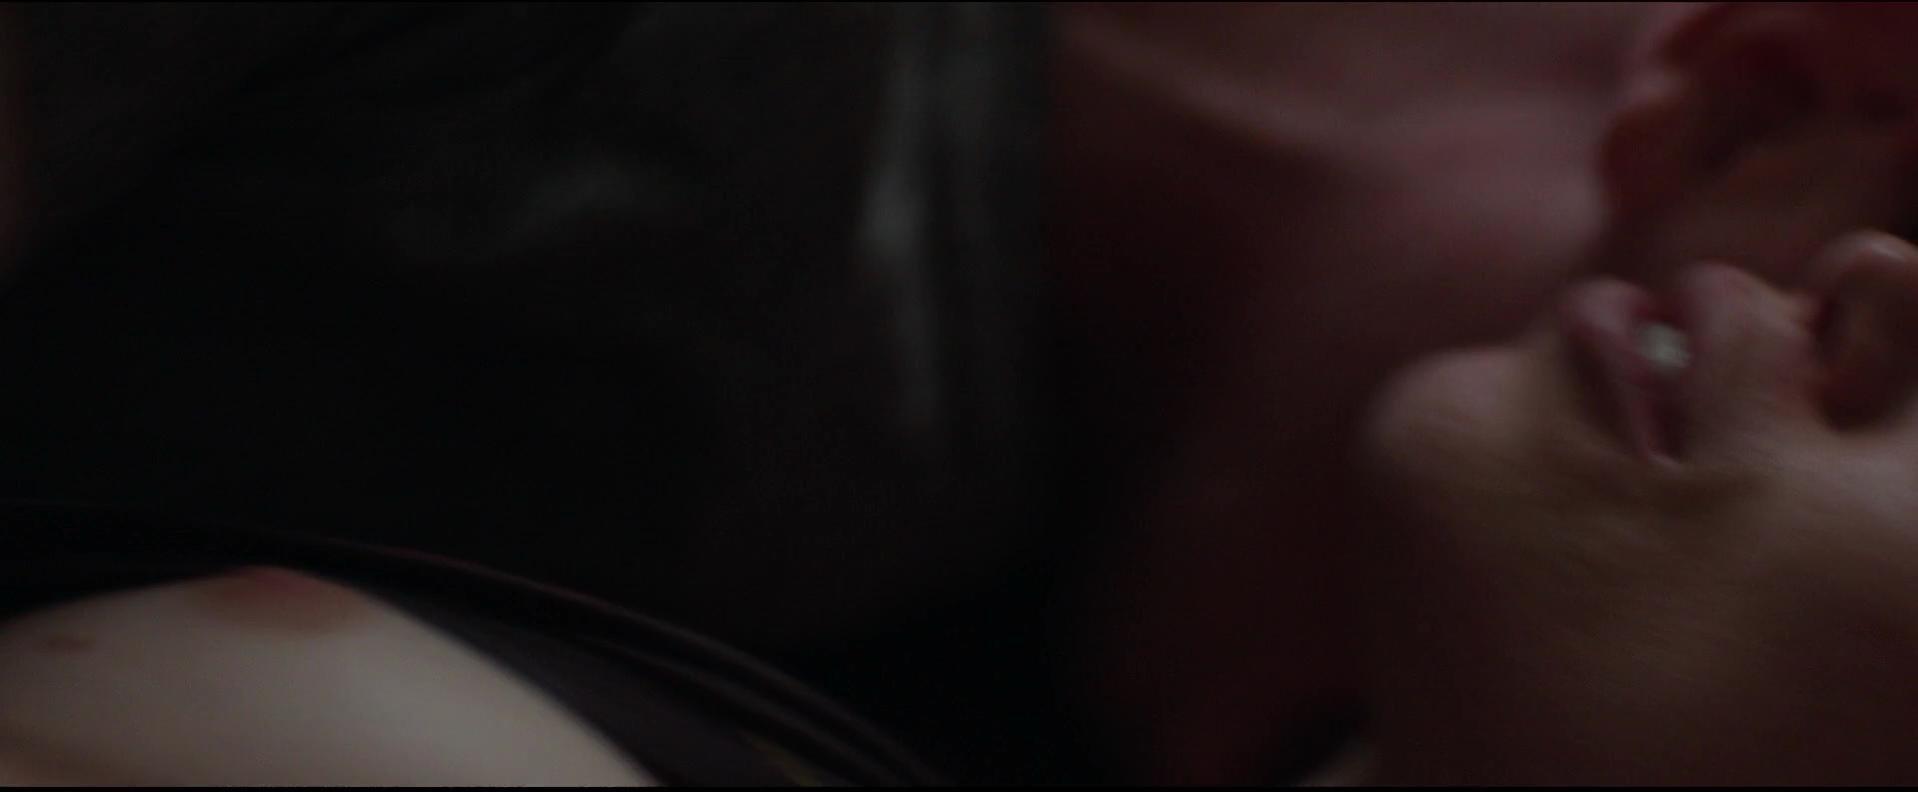 Amanda Fuller nude, Sara Paxton sexy - Cheap Thrills (2013)